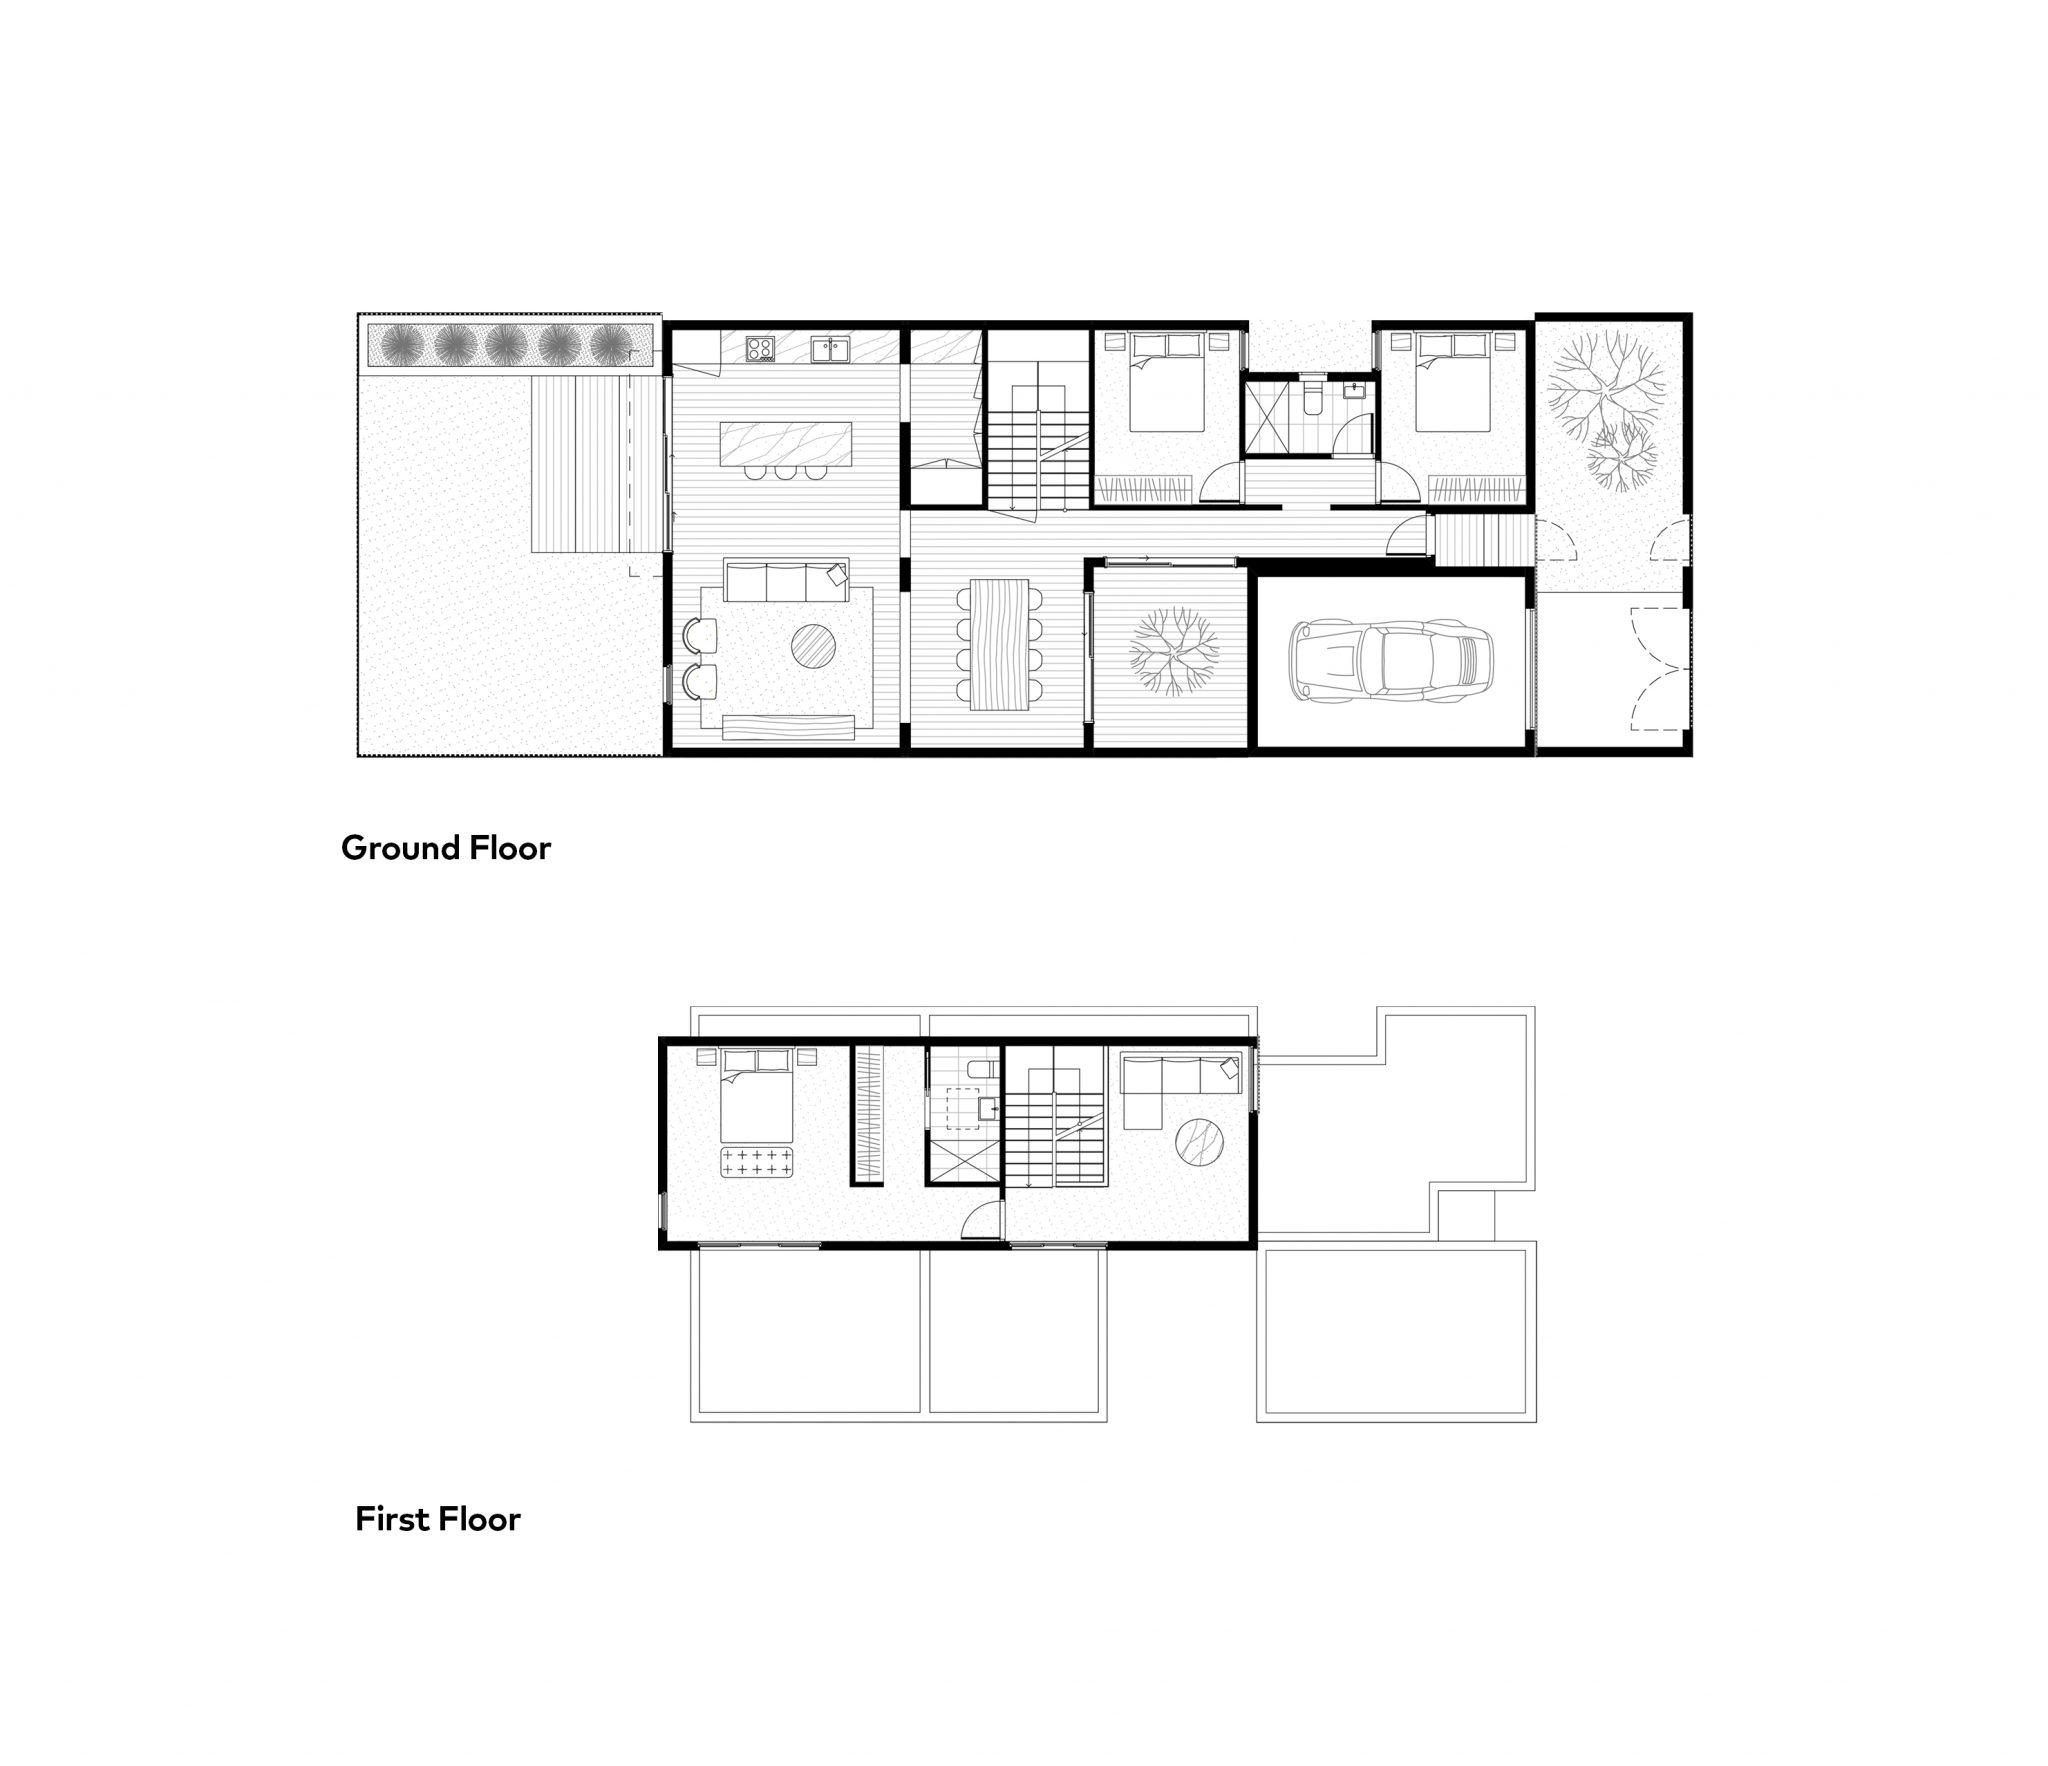 archiblox brunswick east floor plan image